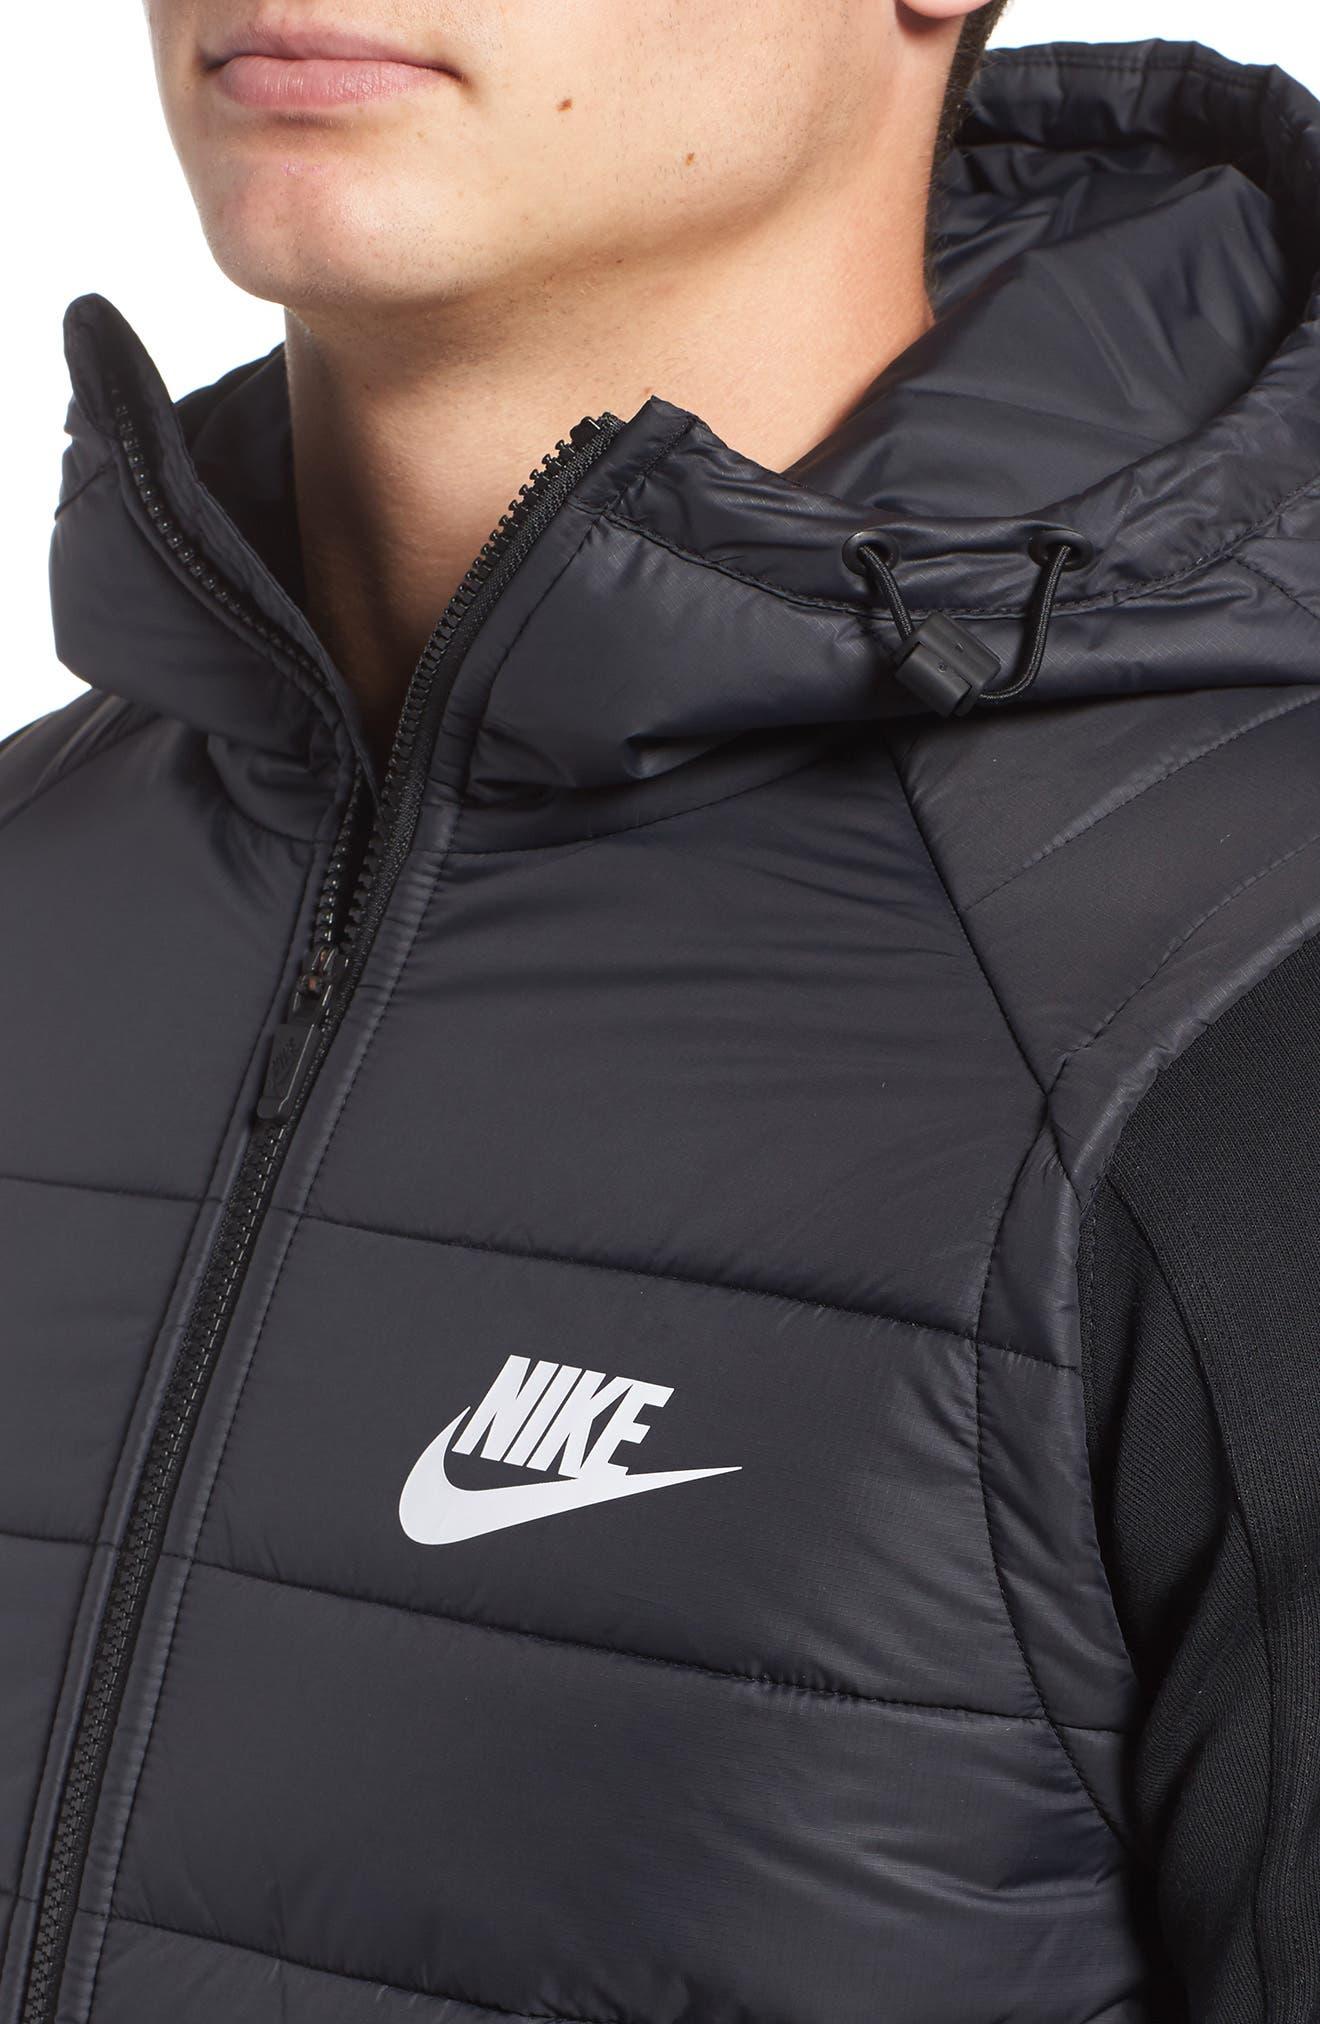 NIKE,                             Sportswear Advance 15 Jacket,                             Alternate thumbnail 4, color,                             010